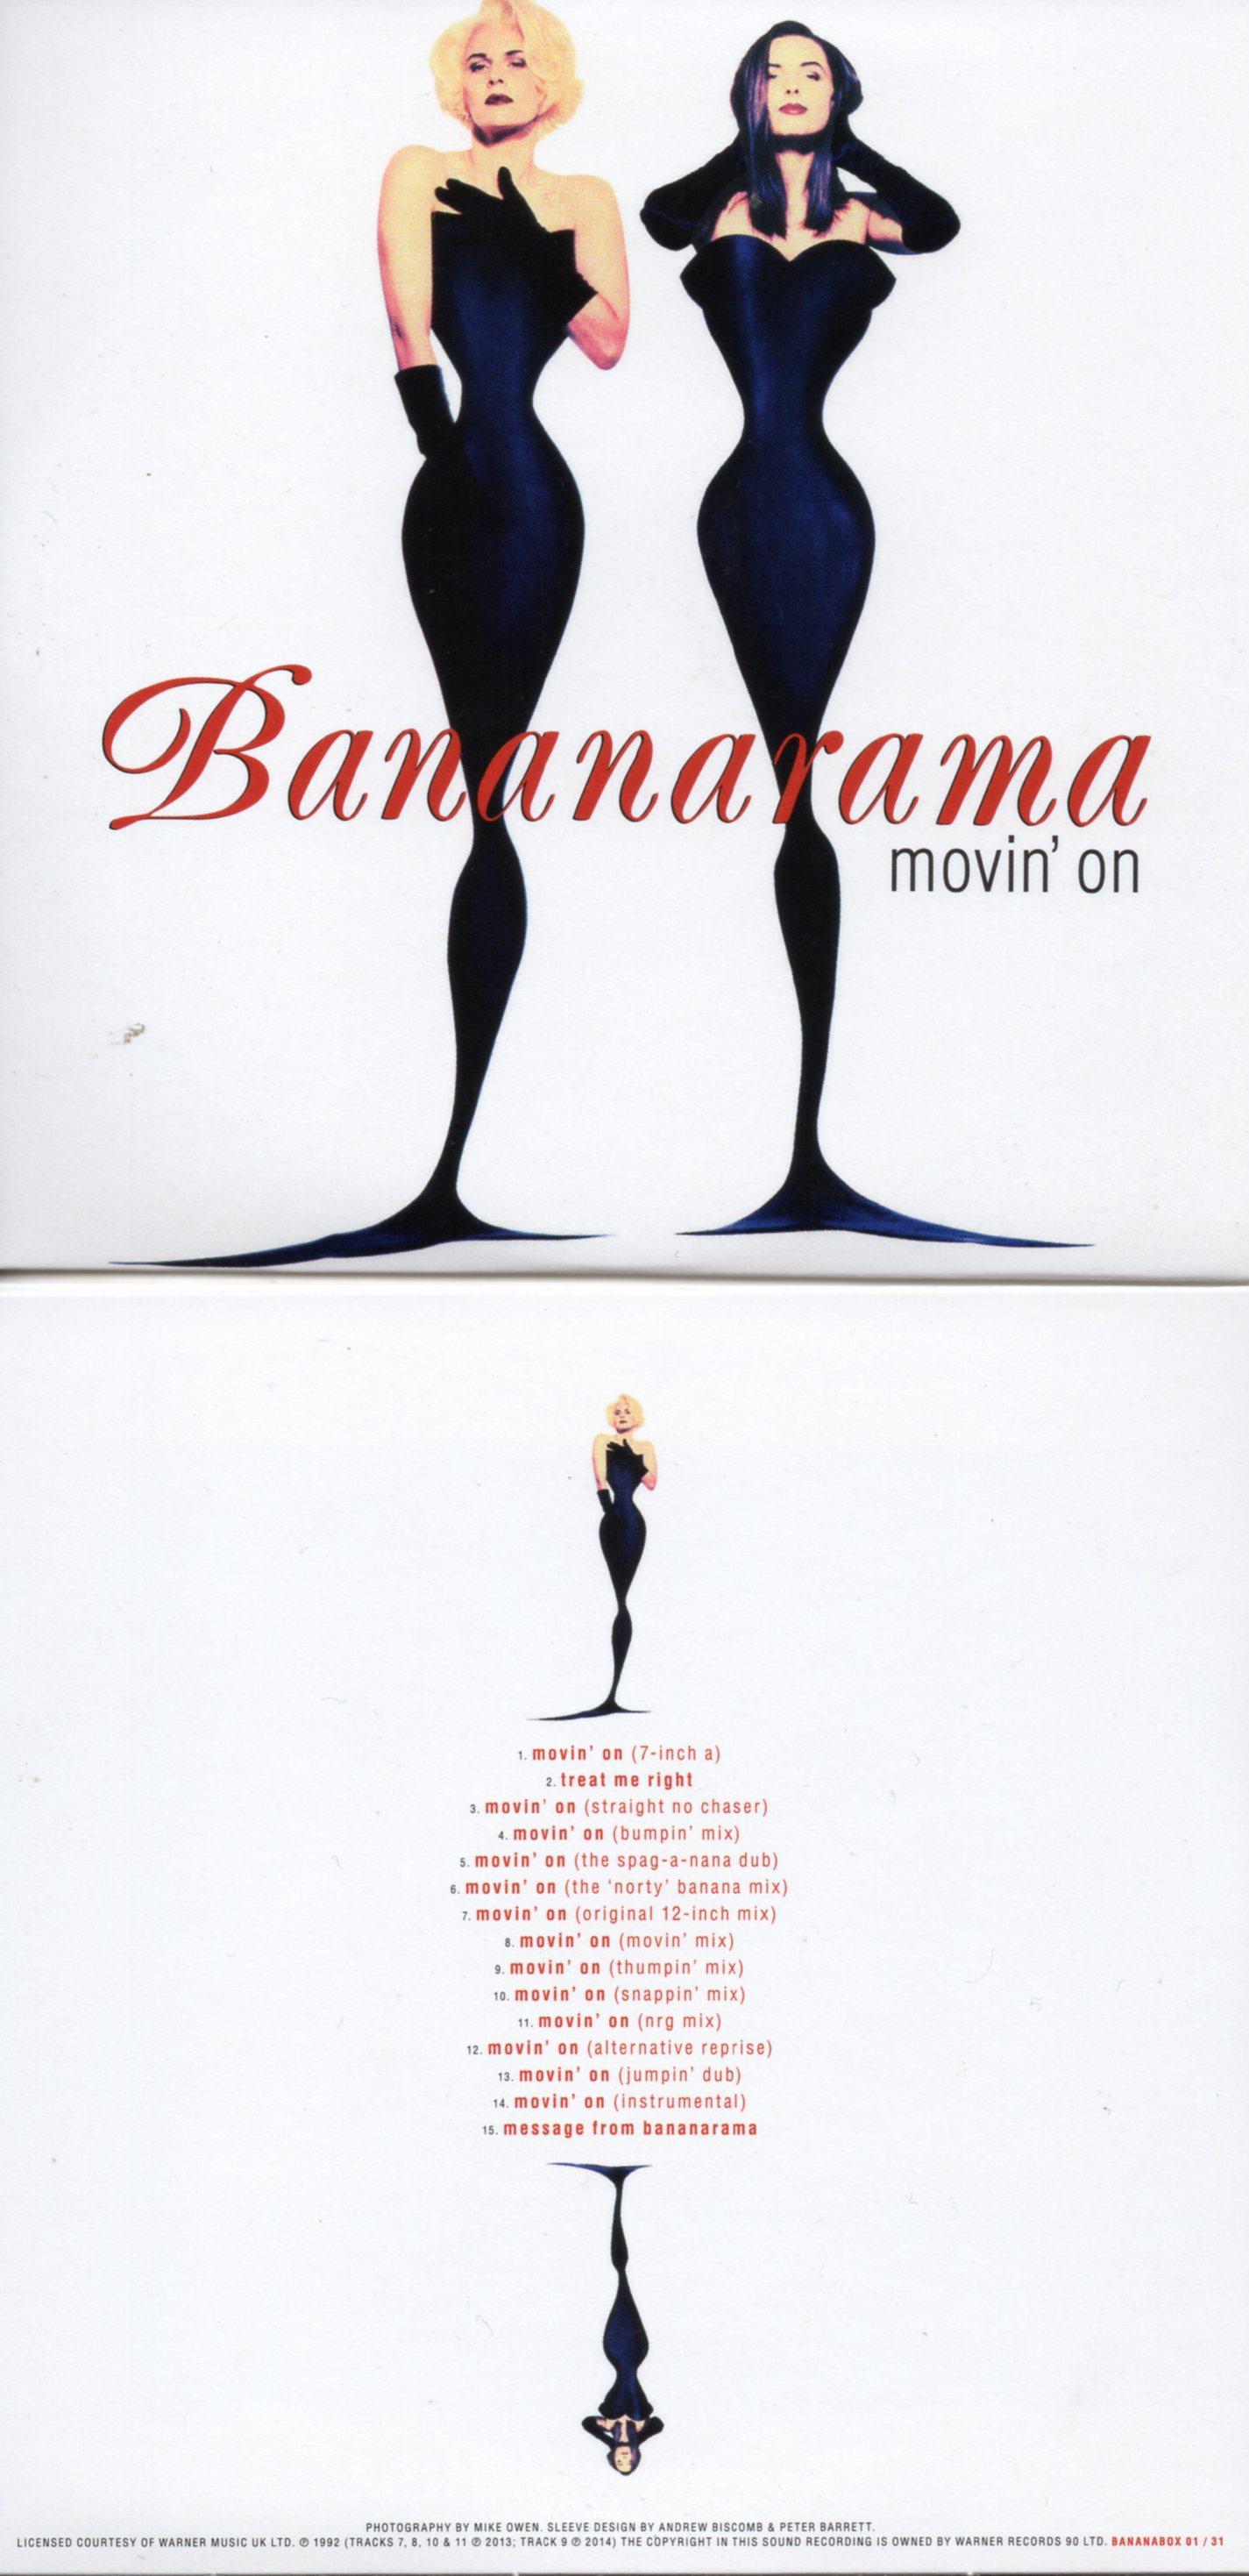 BANANARAMA - MOVIN' ON (1992) 15-TRACK CARD SLEEVE - CD single